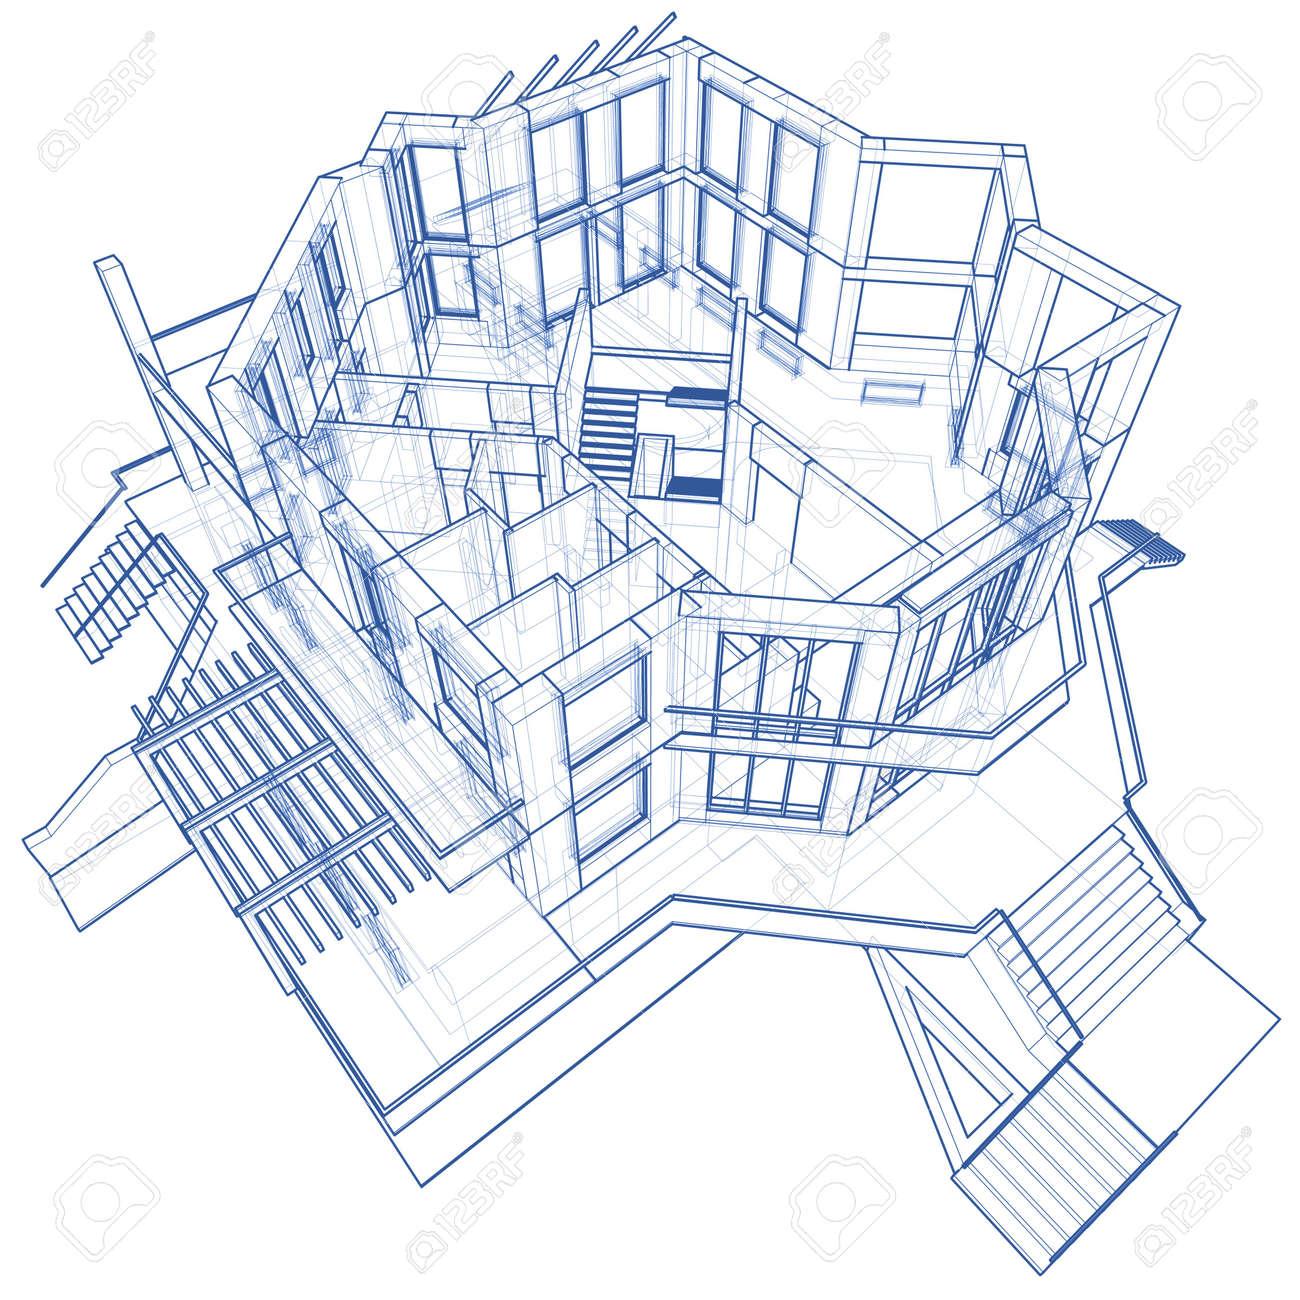 3d blueprint house vector technical draw stock photo picture and 3d blueprint house vector technical draw stock photo 3750088 malvernweather Choice Image